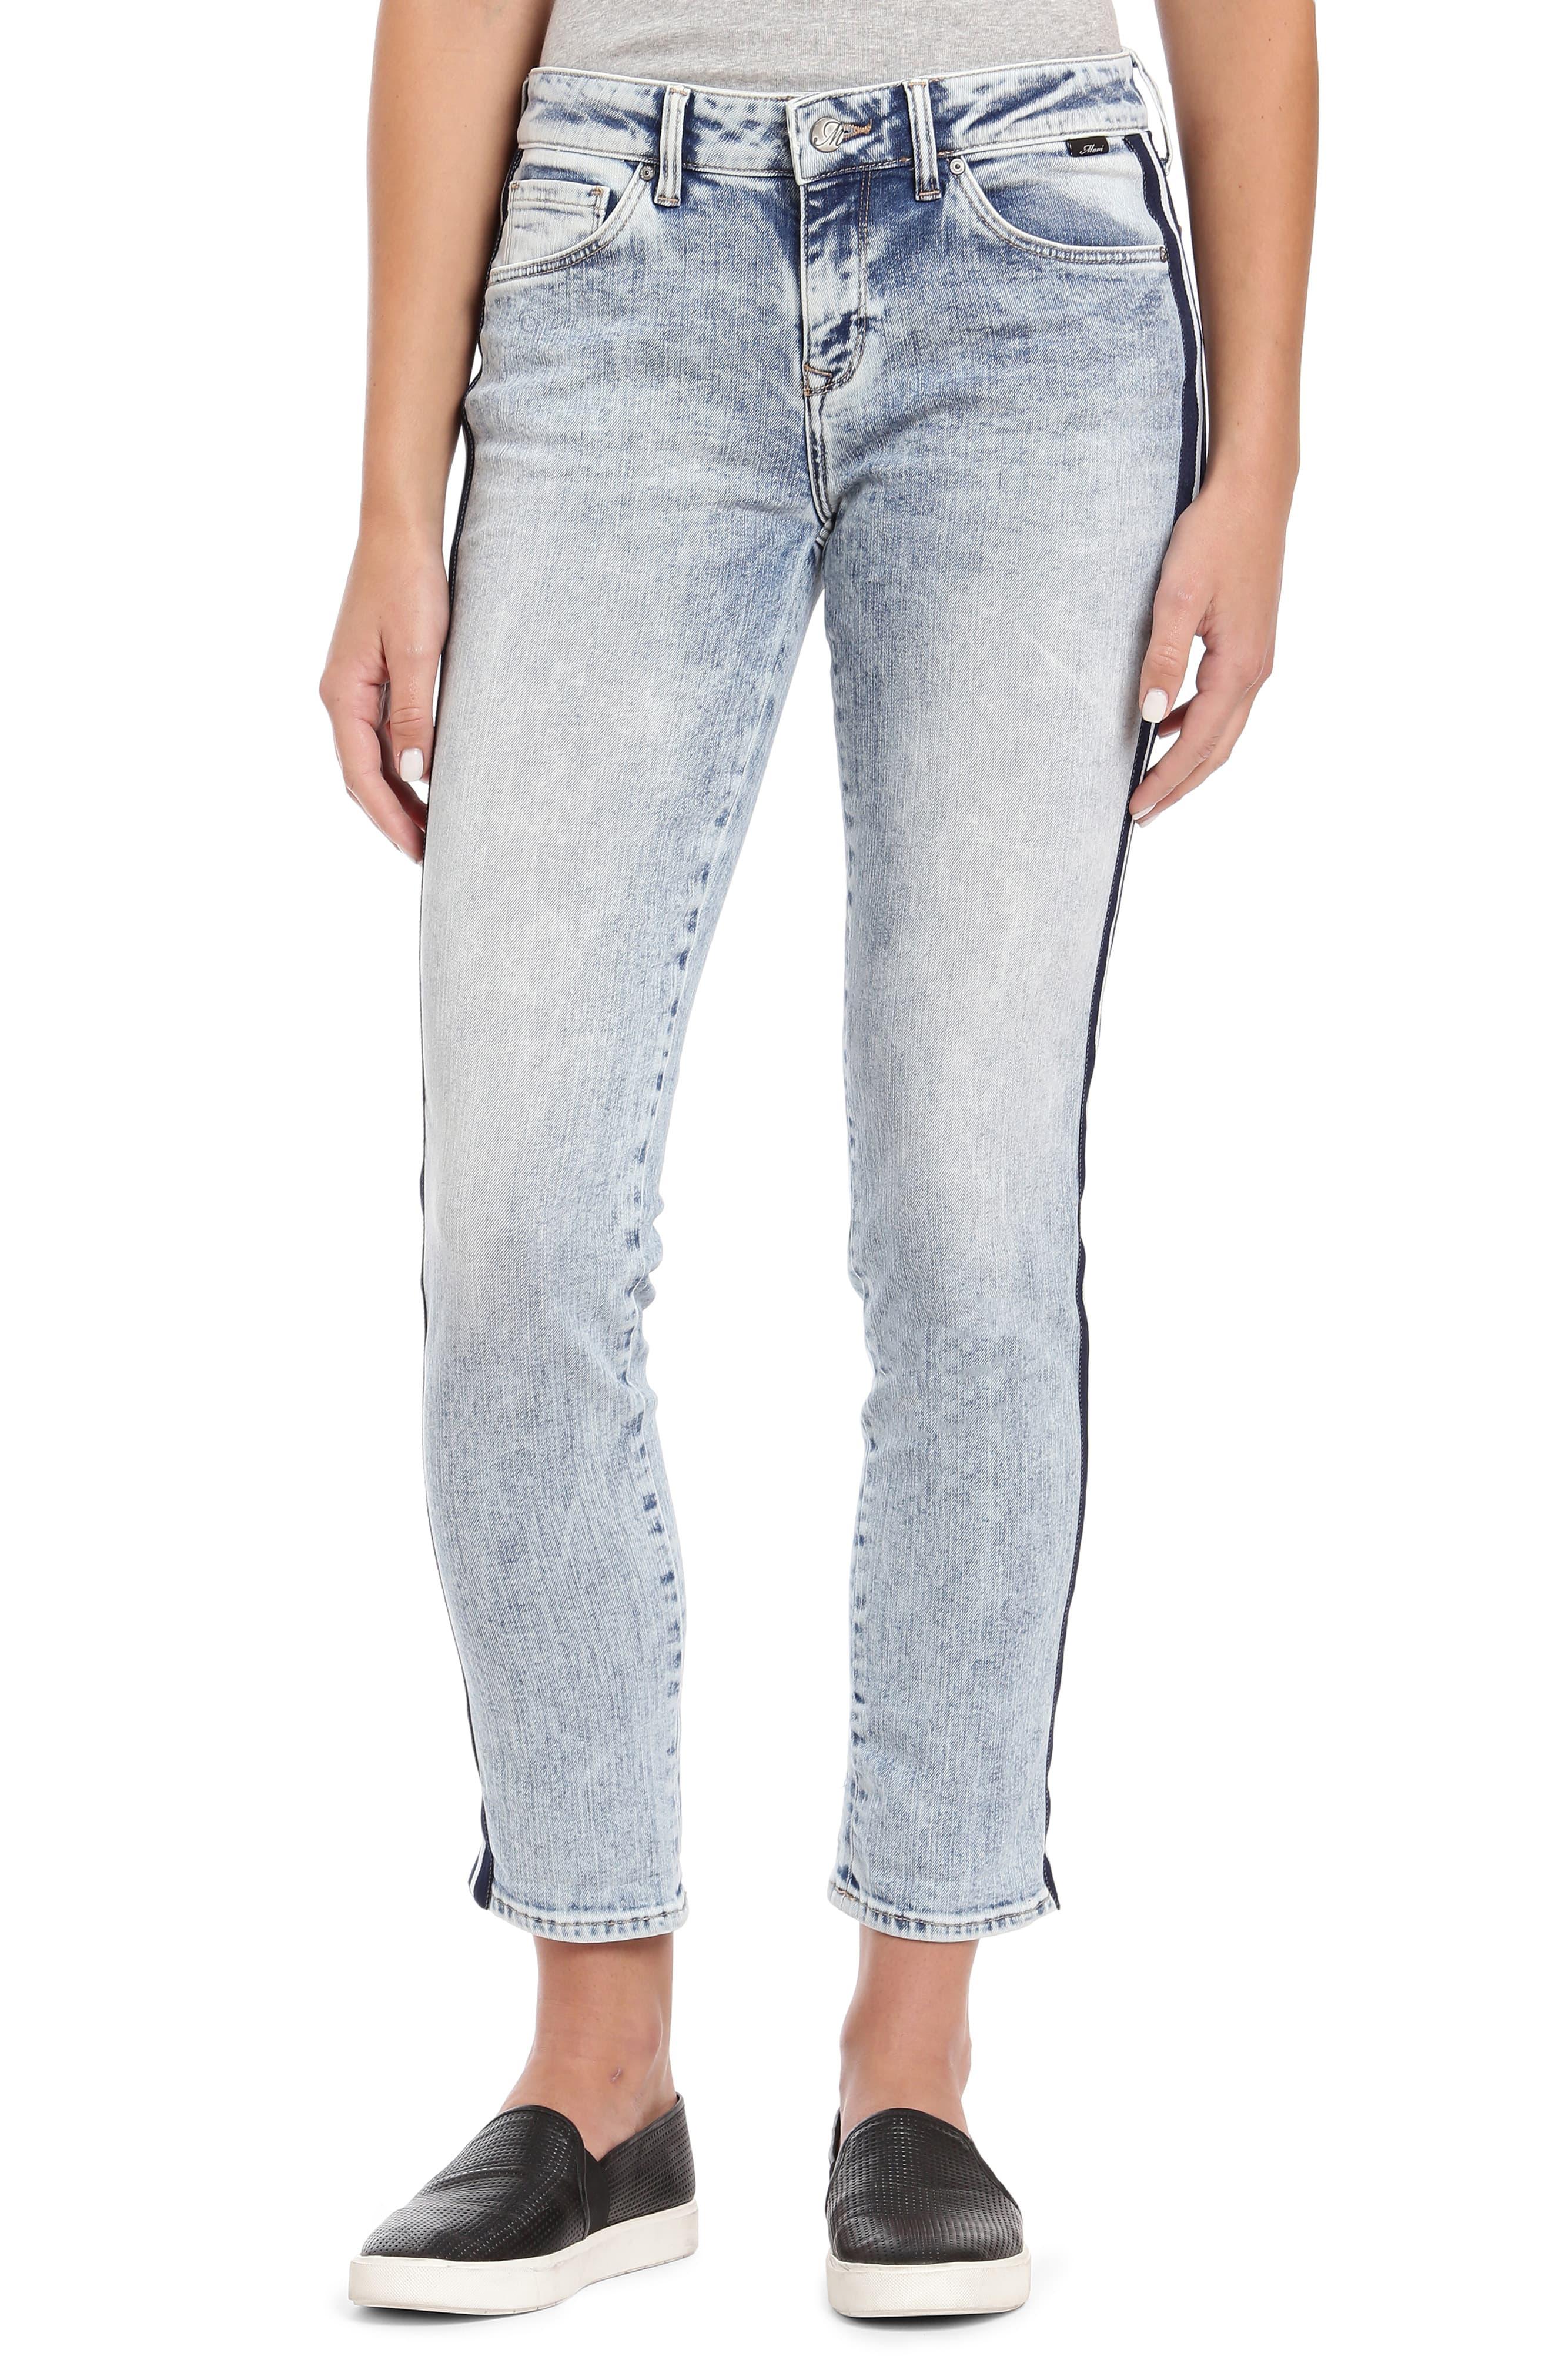 Mavi Jeans Ada Mid Ripped Vintage Boyfriend Cut